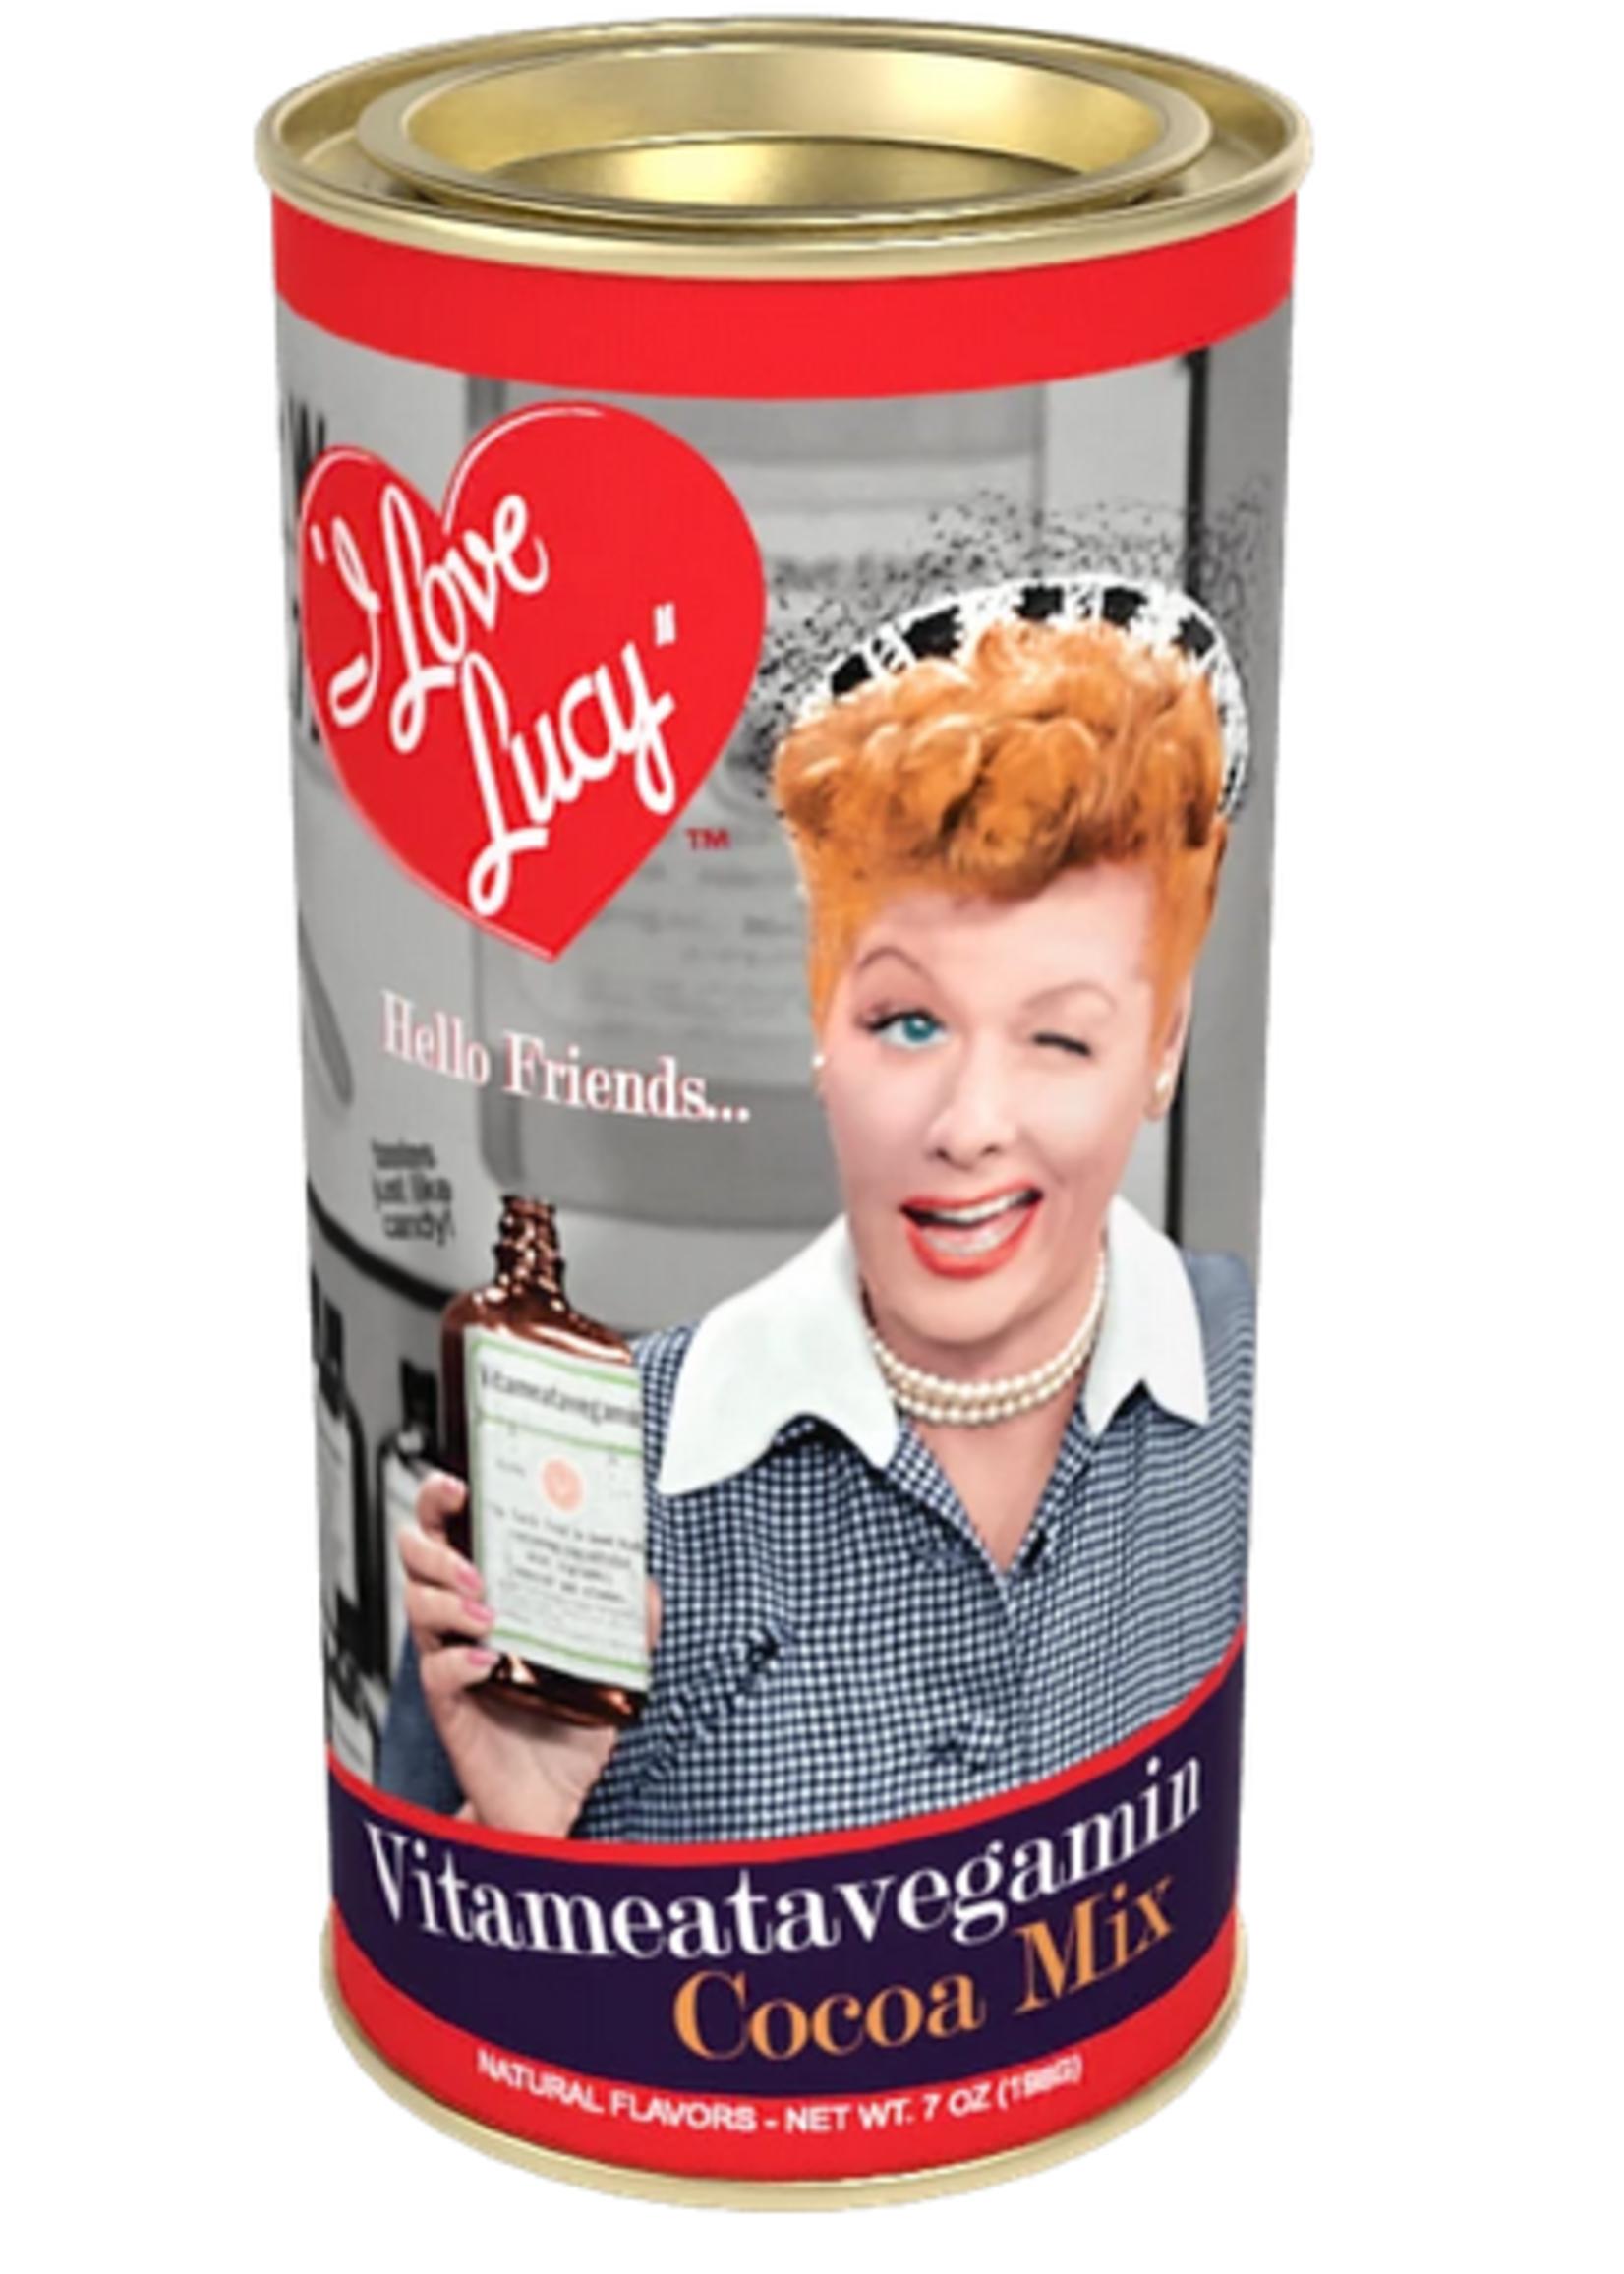 McSteven's, Inc. Lucy Vitameatavegamin Cocoa Mix